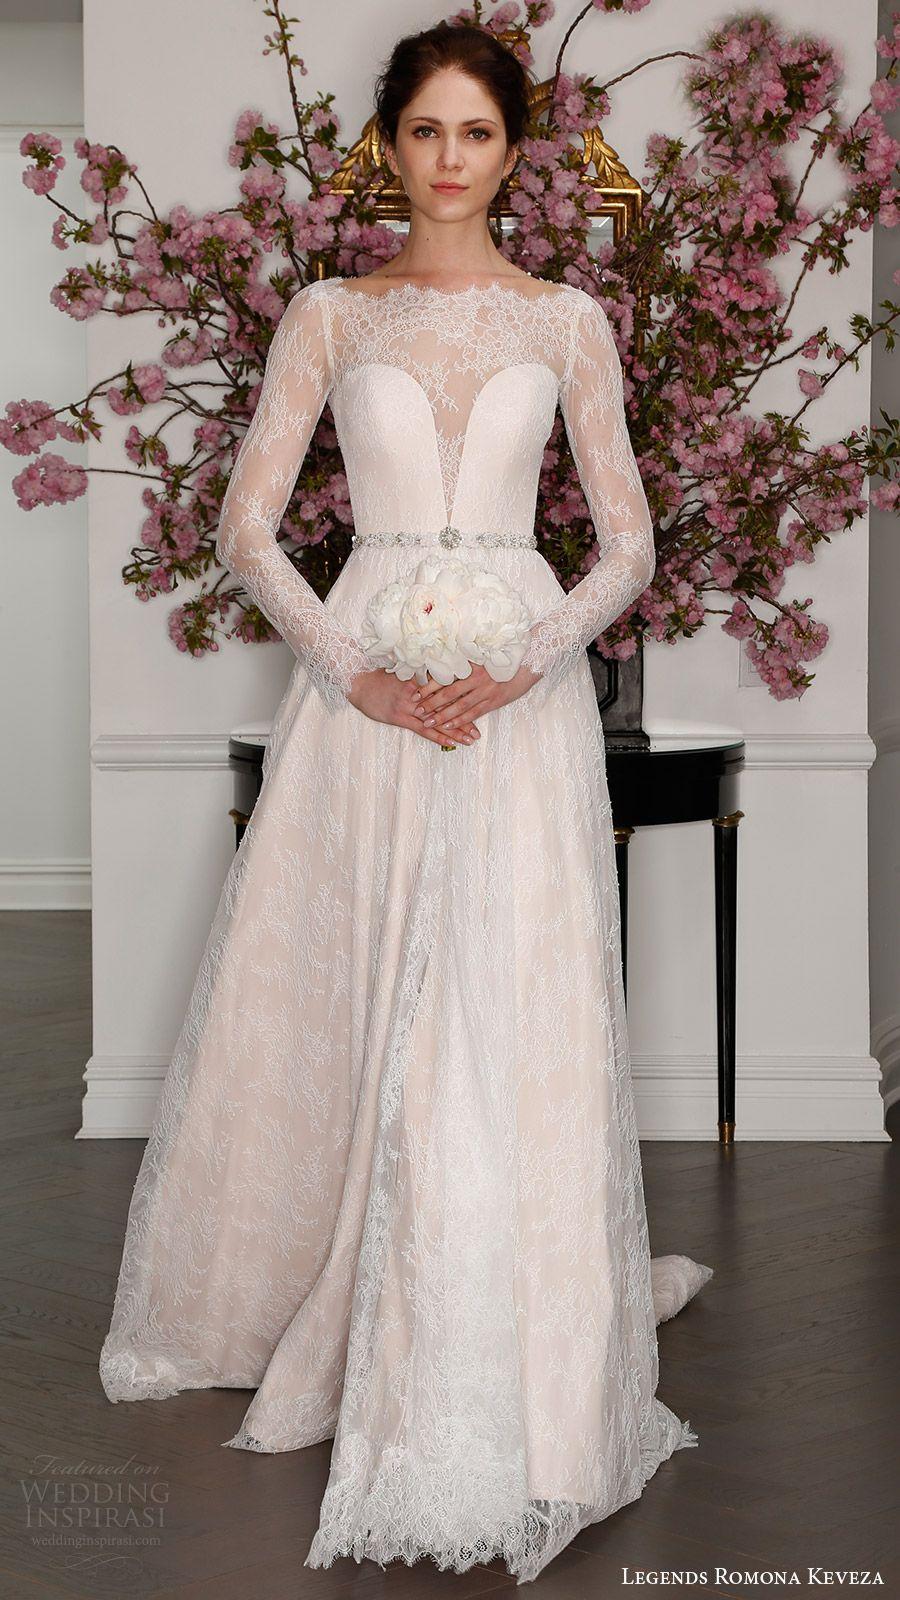 Legends romona keveza spring wedding dresses blush color